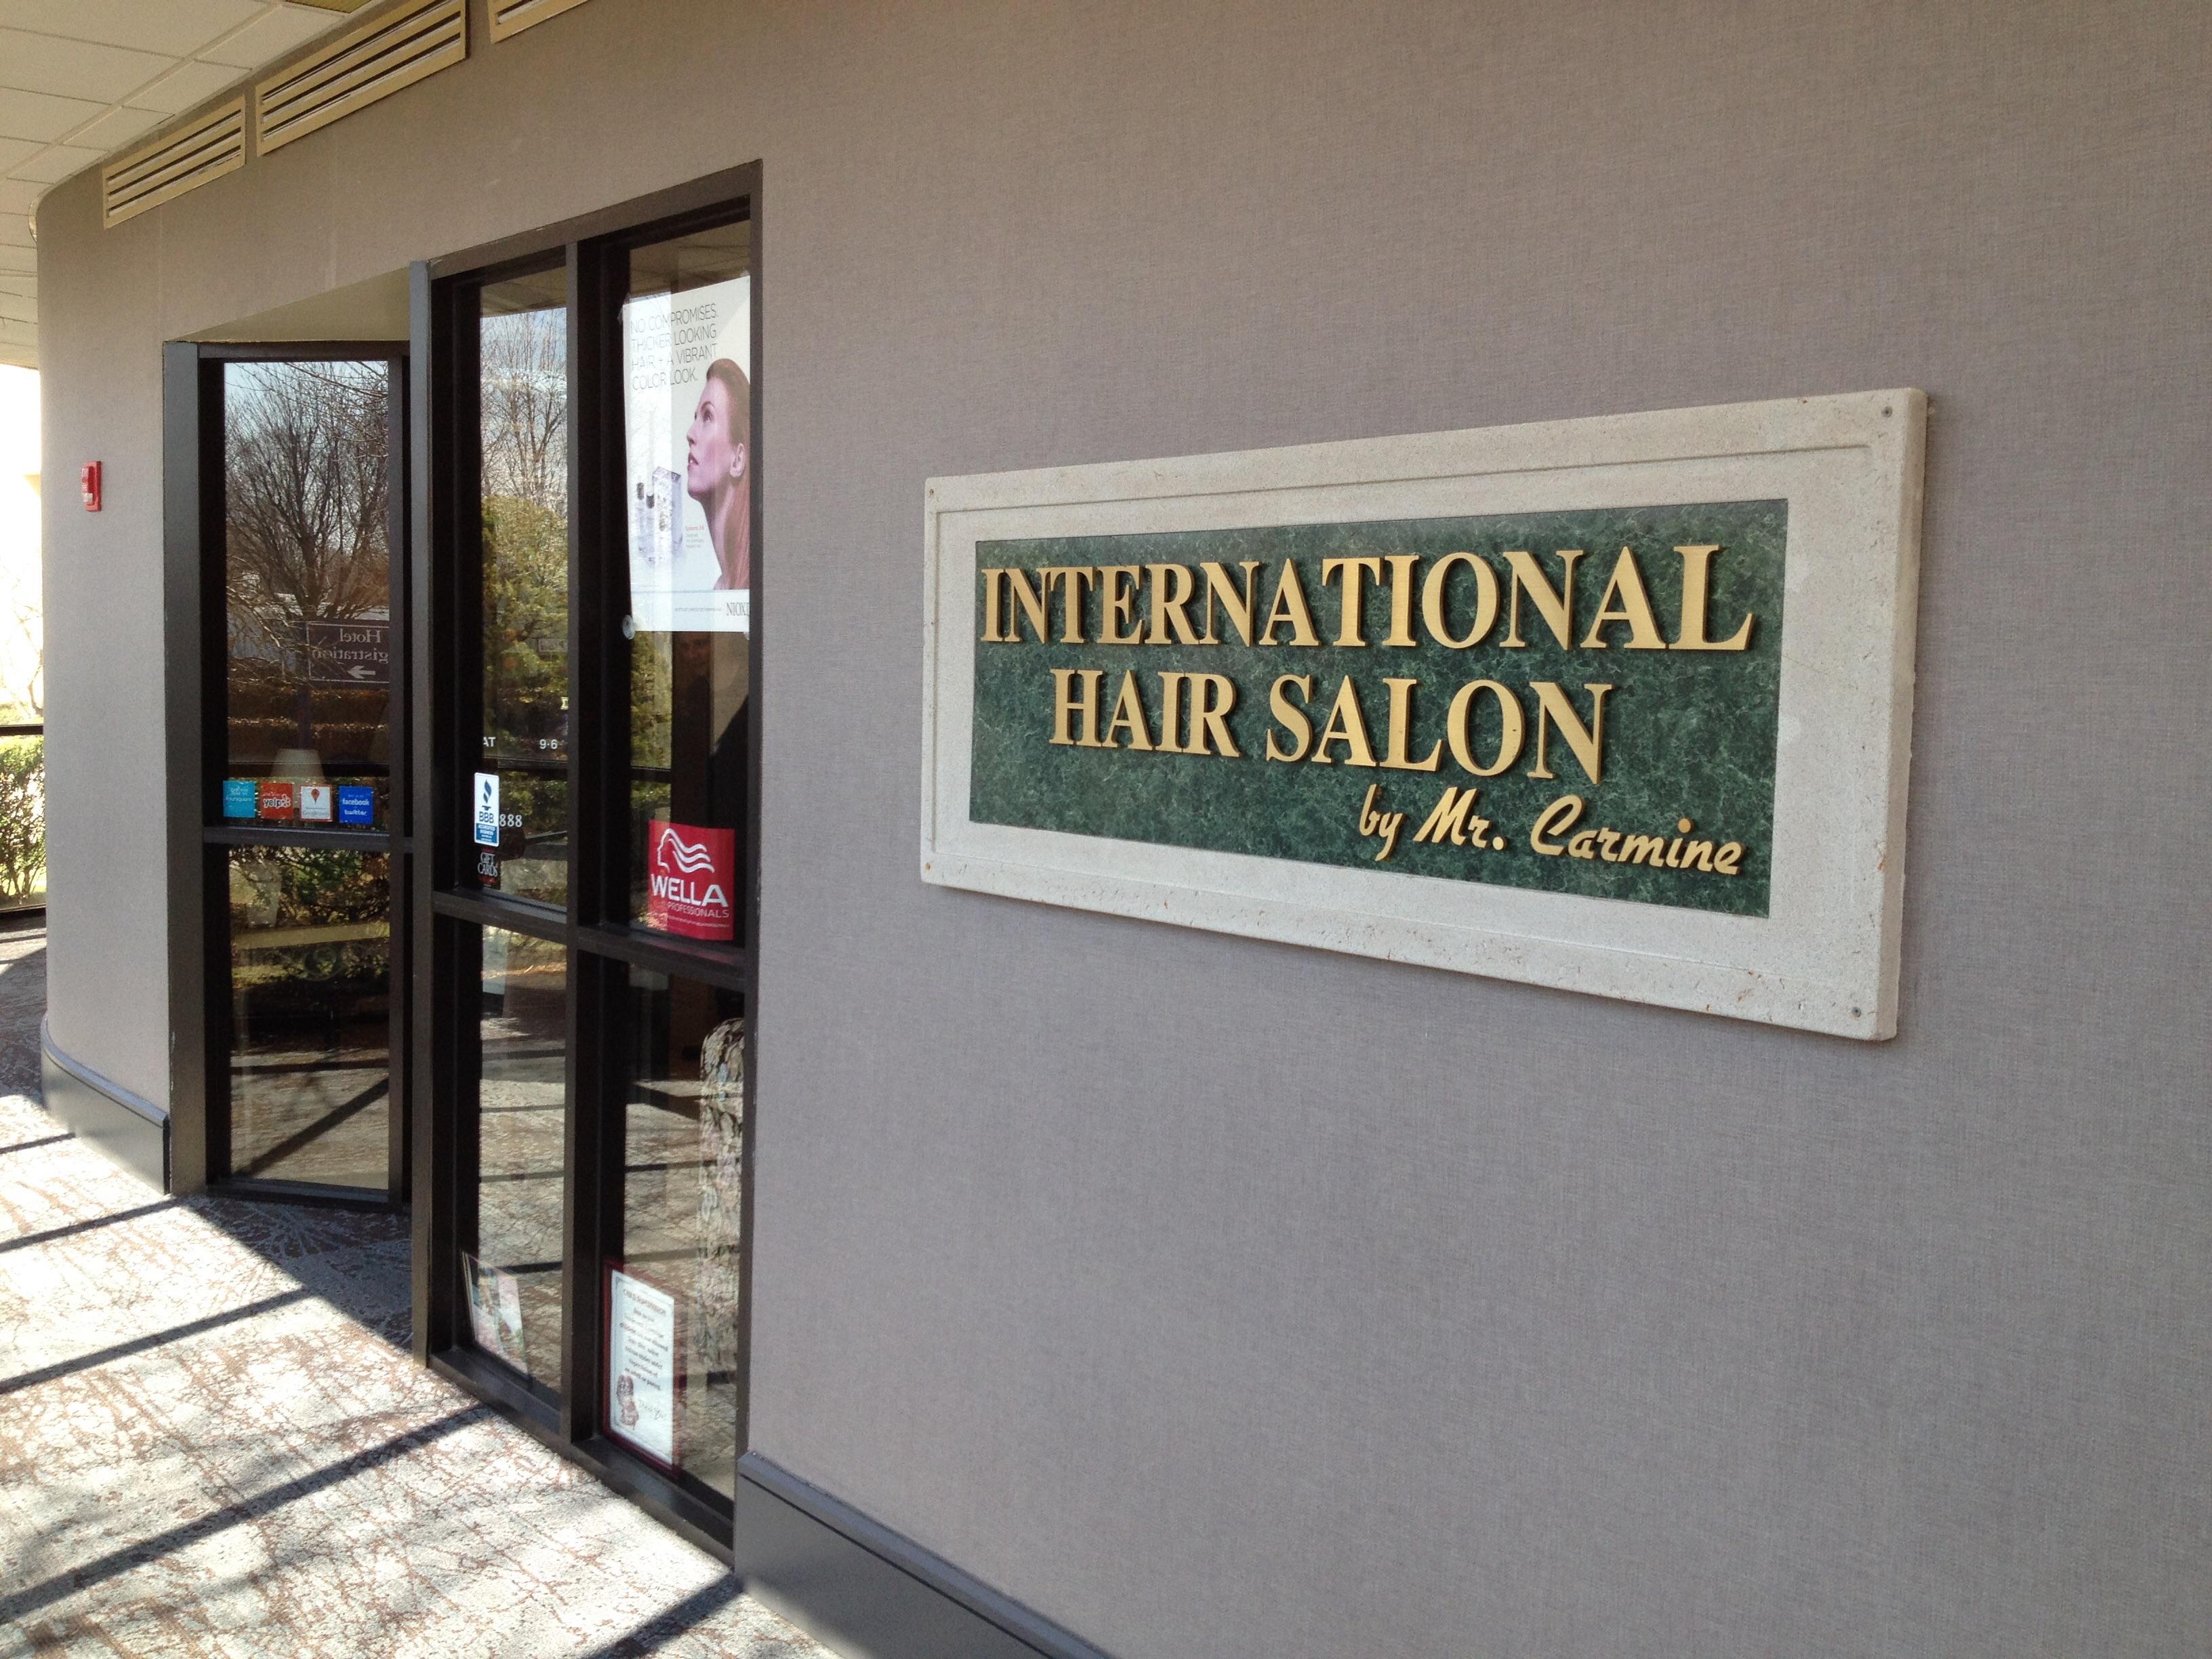 International Hair Salon By Mr. Carmine, Stamford CT